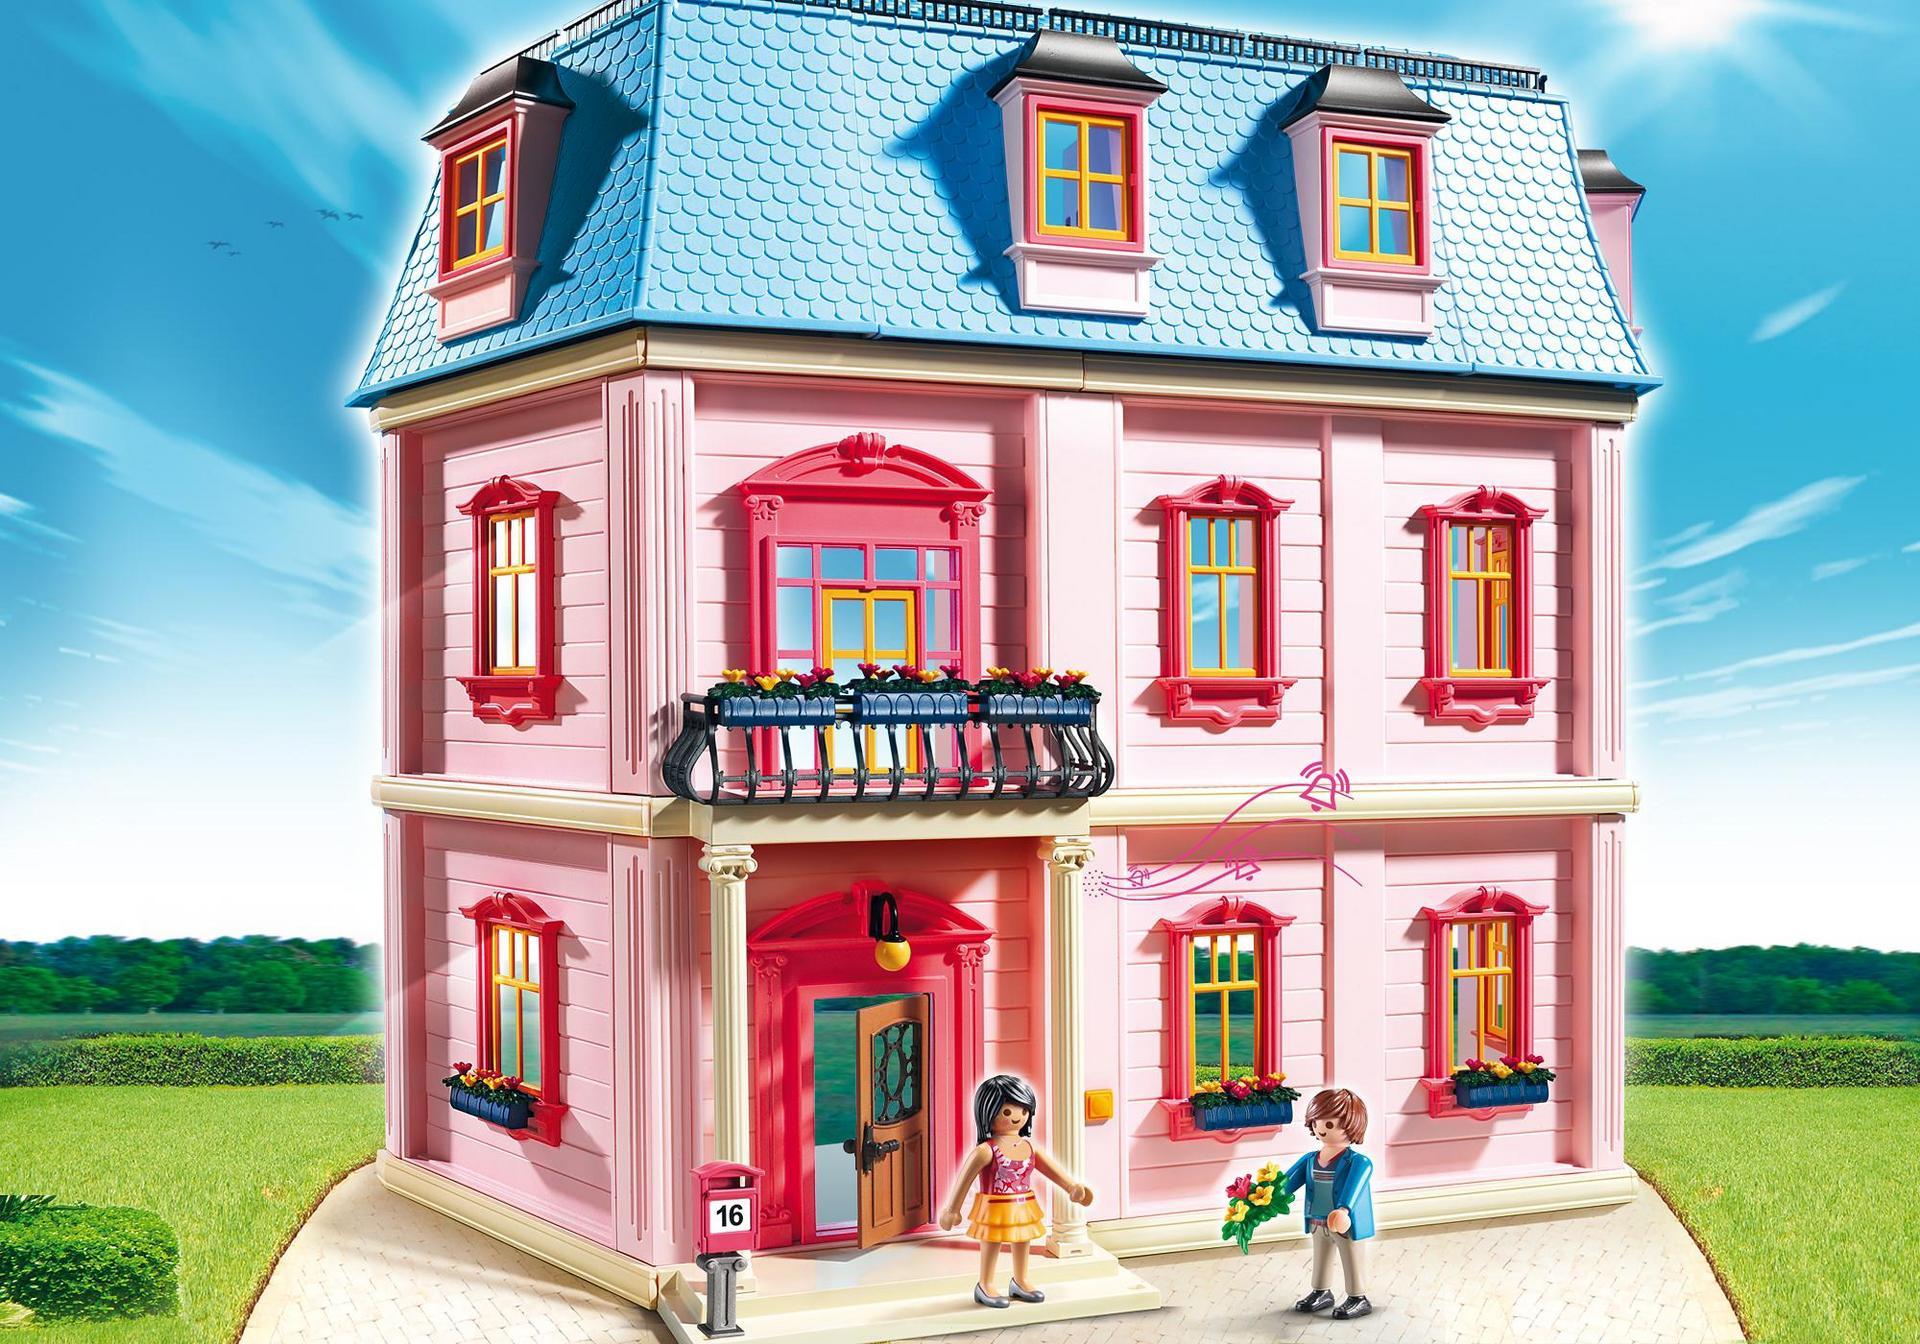 Deluxe Dollhouse 5303 Playmobil